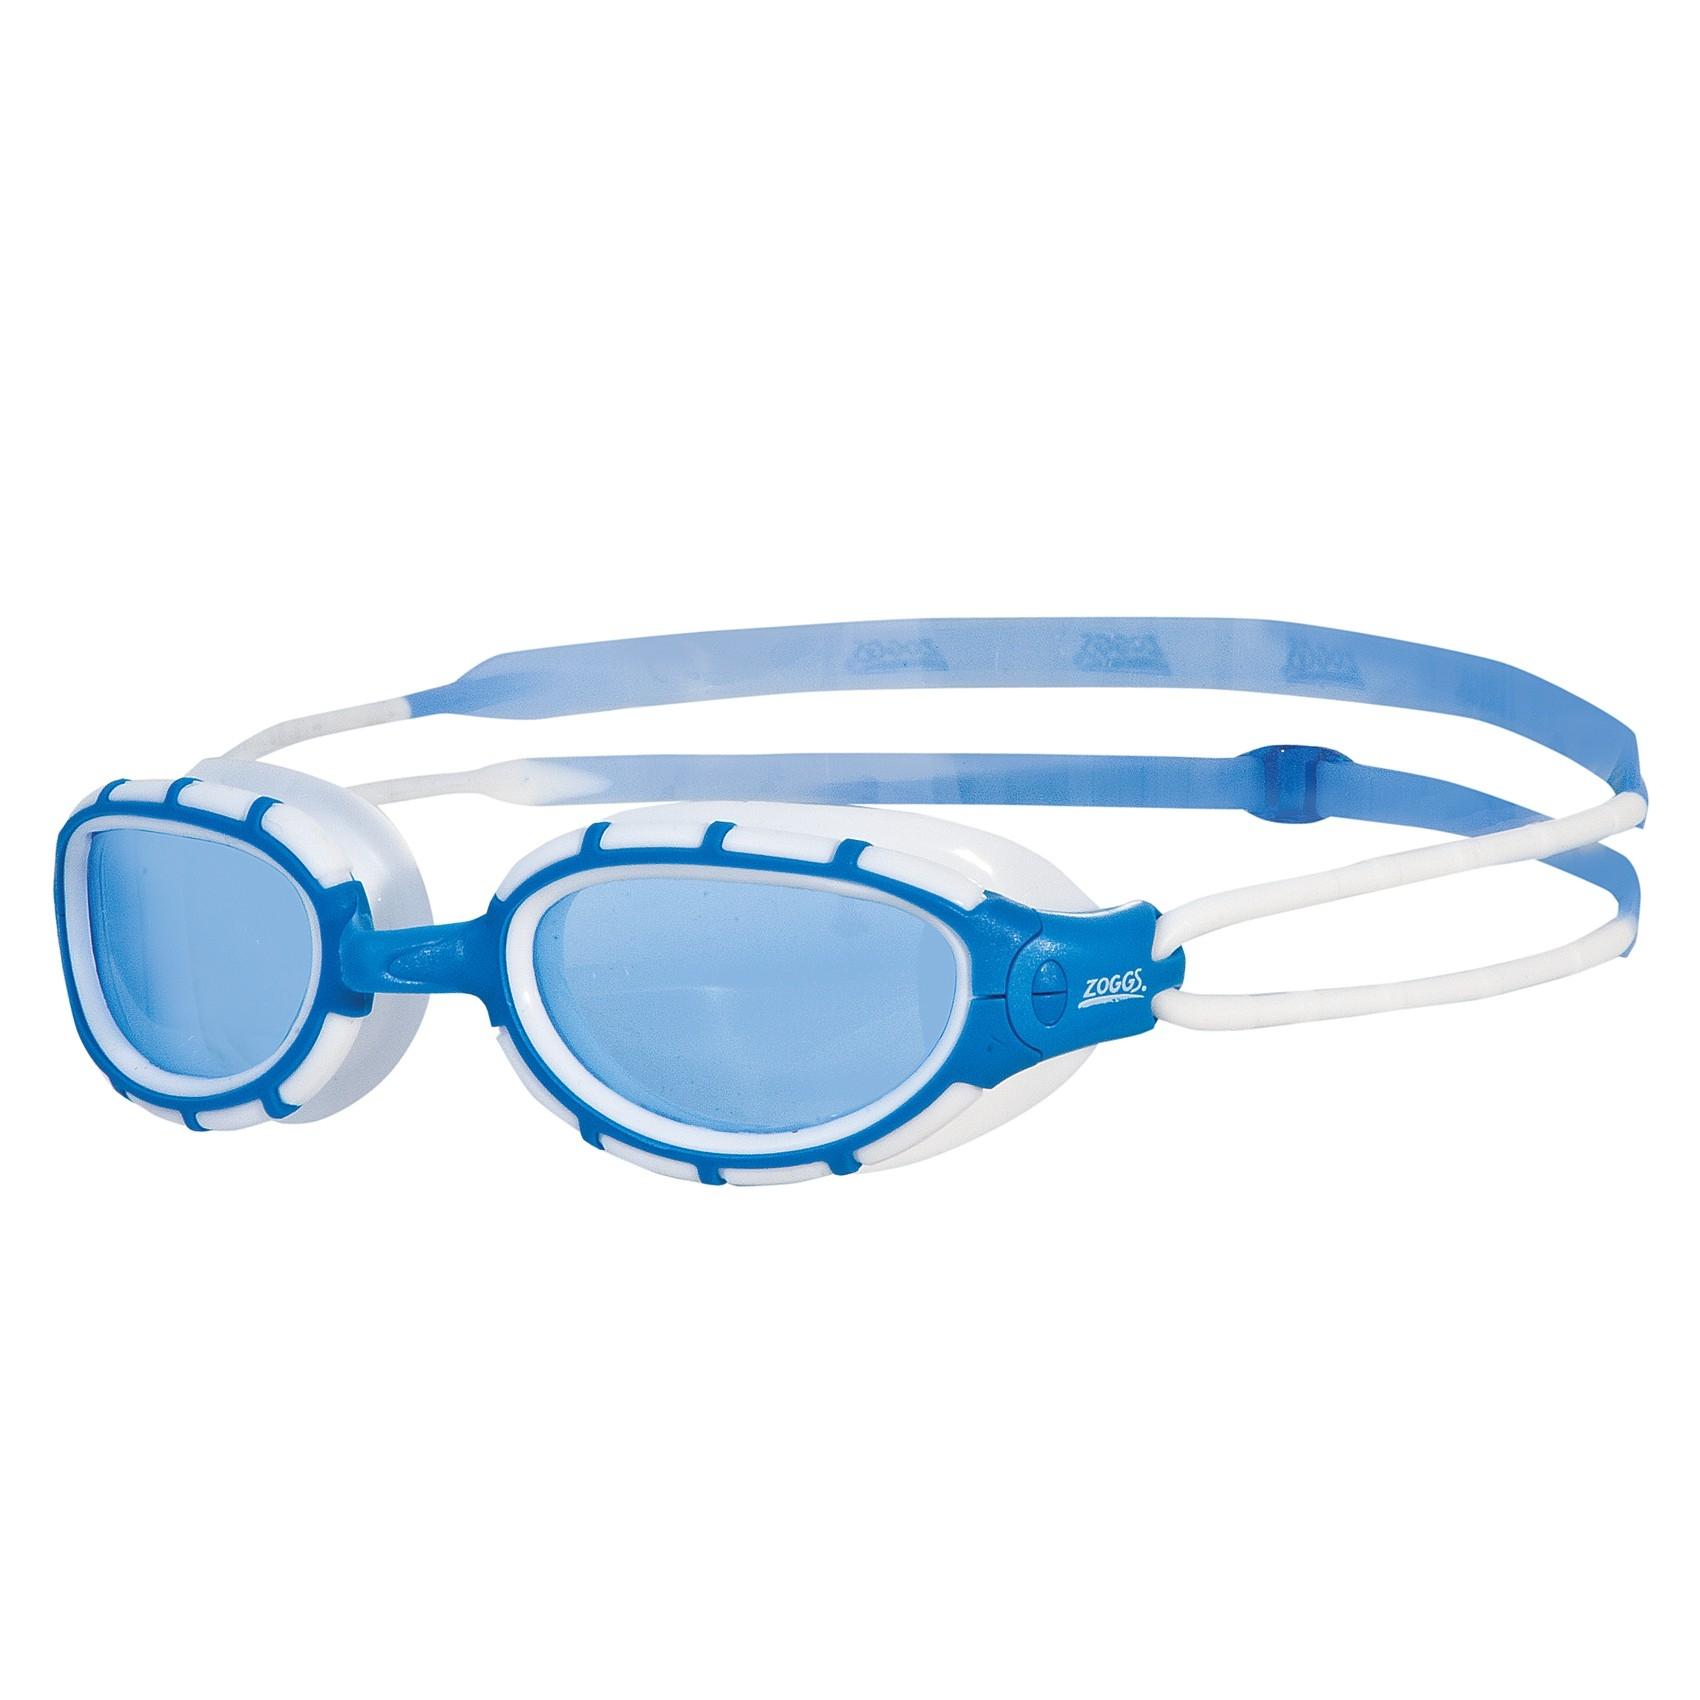 new zoggs predator junior swimming goggles anti fog kids swim pool goggle ebay